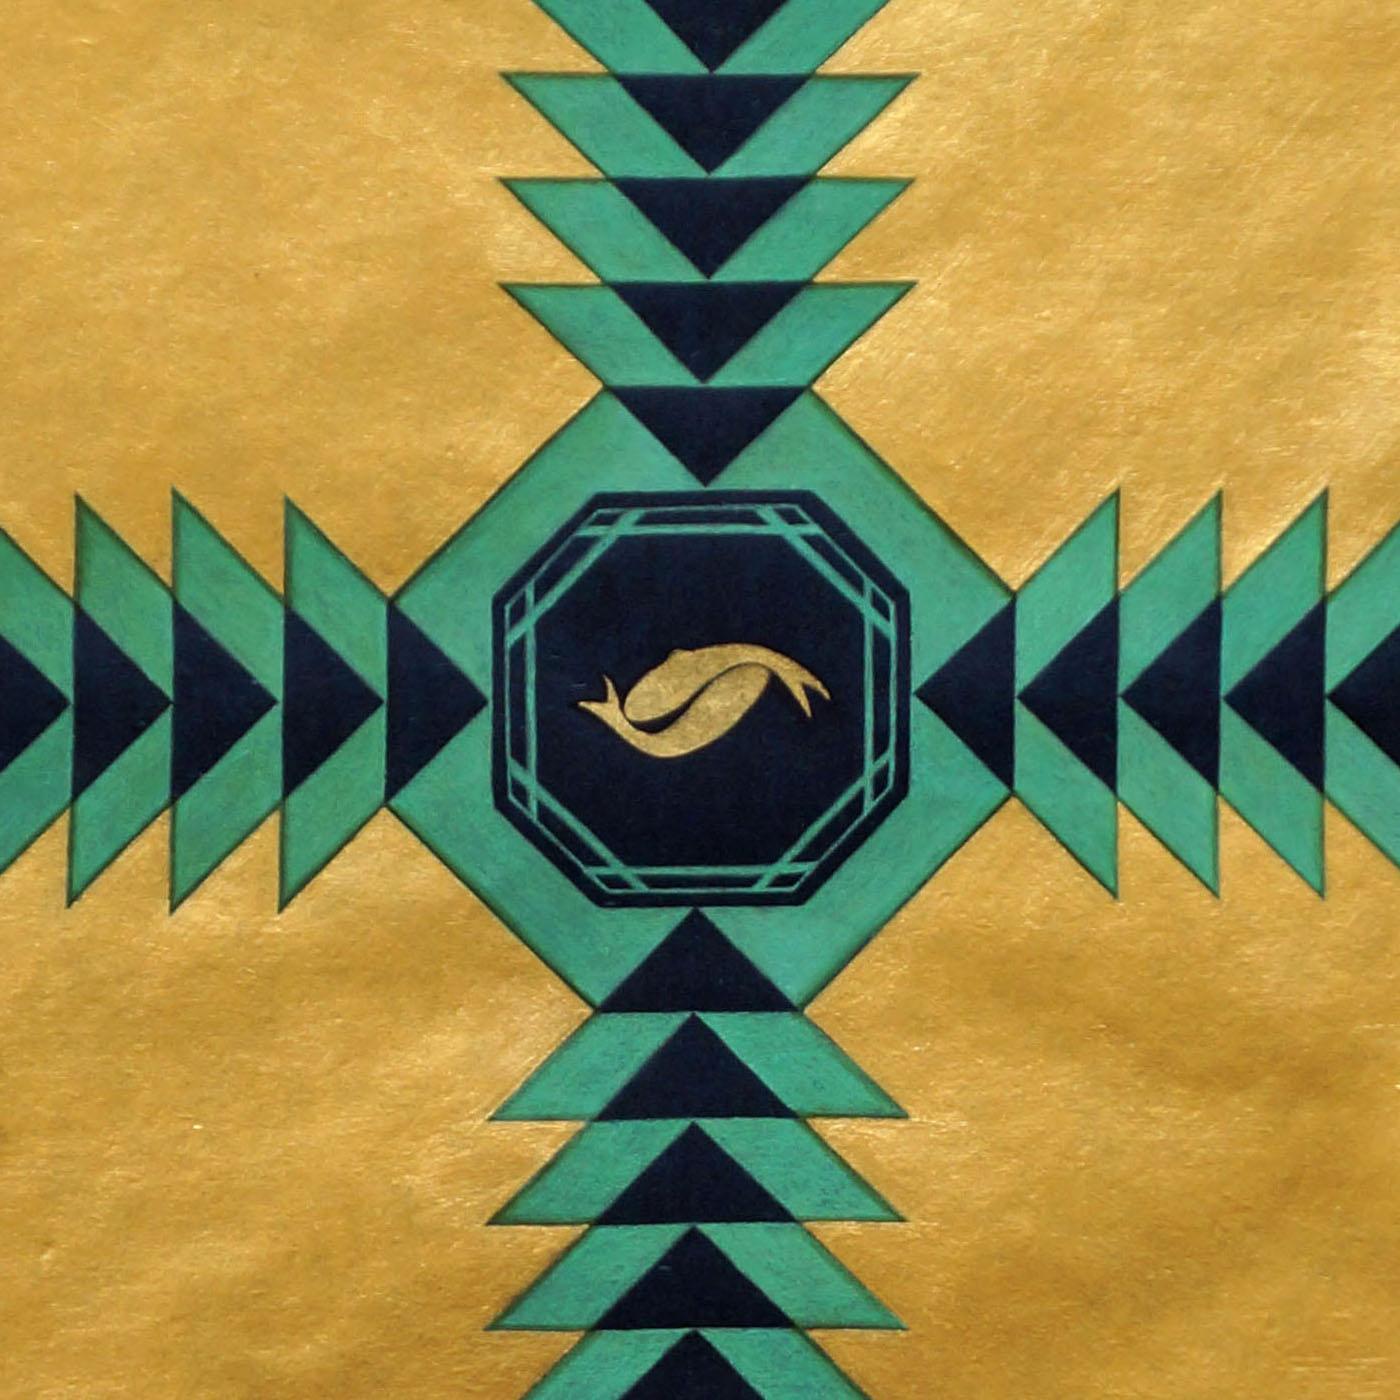 Khizrnama (Fountain) , 2013  detail  24-karat gold, malachite and acrylic on handmade indigo wasli paper  17 x 13 inches